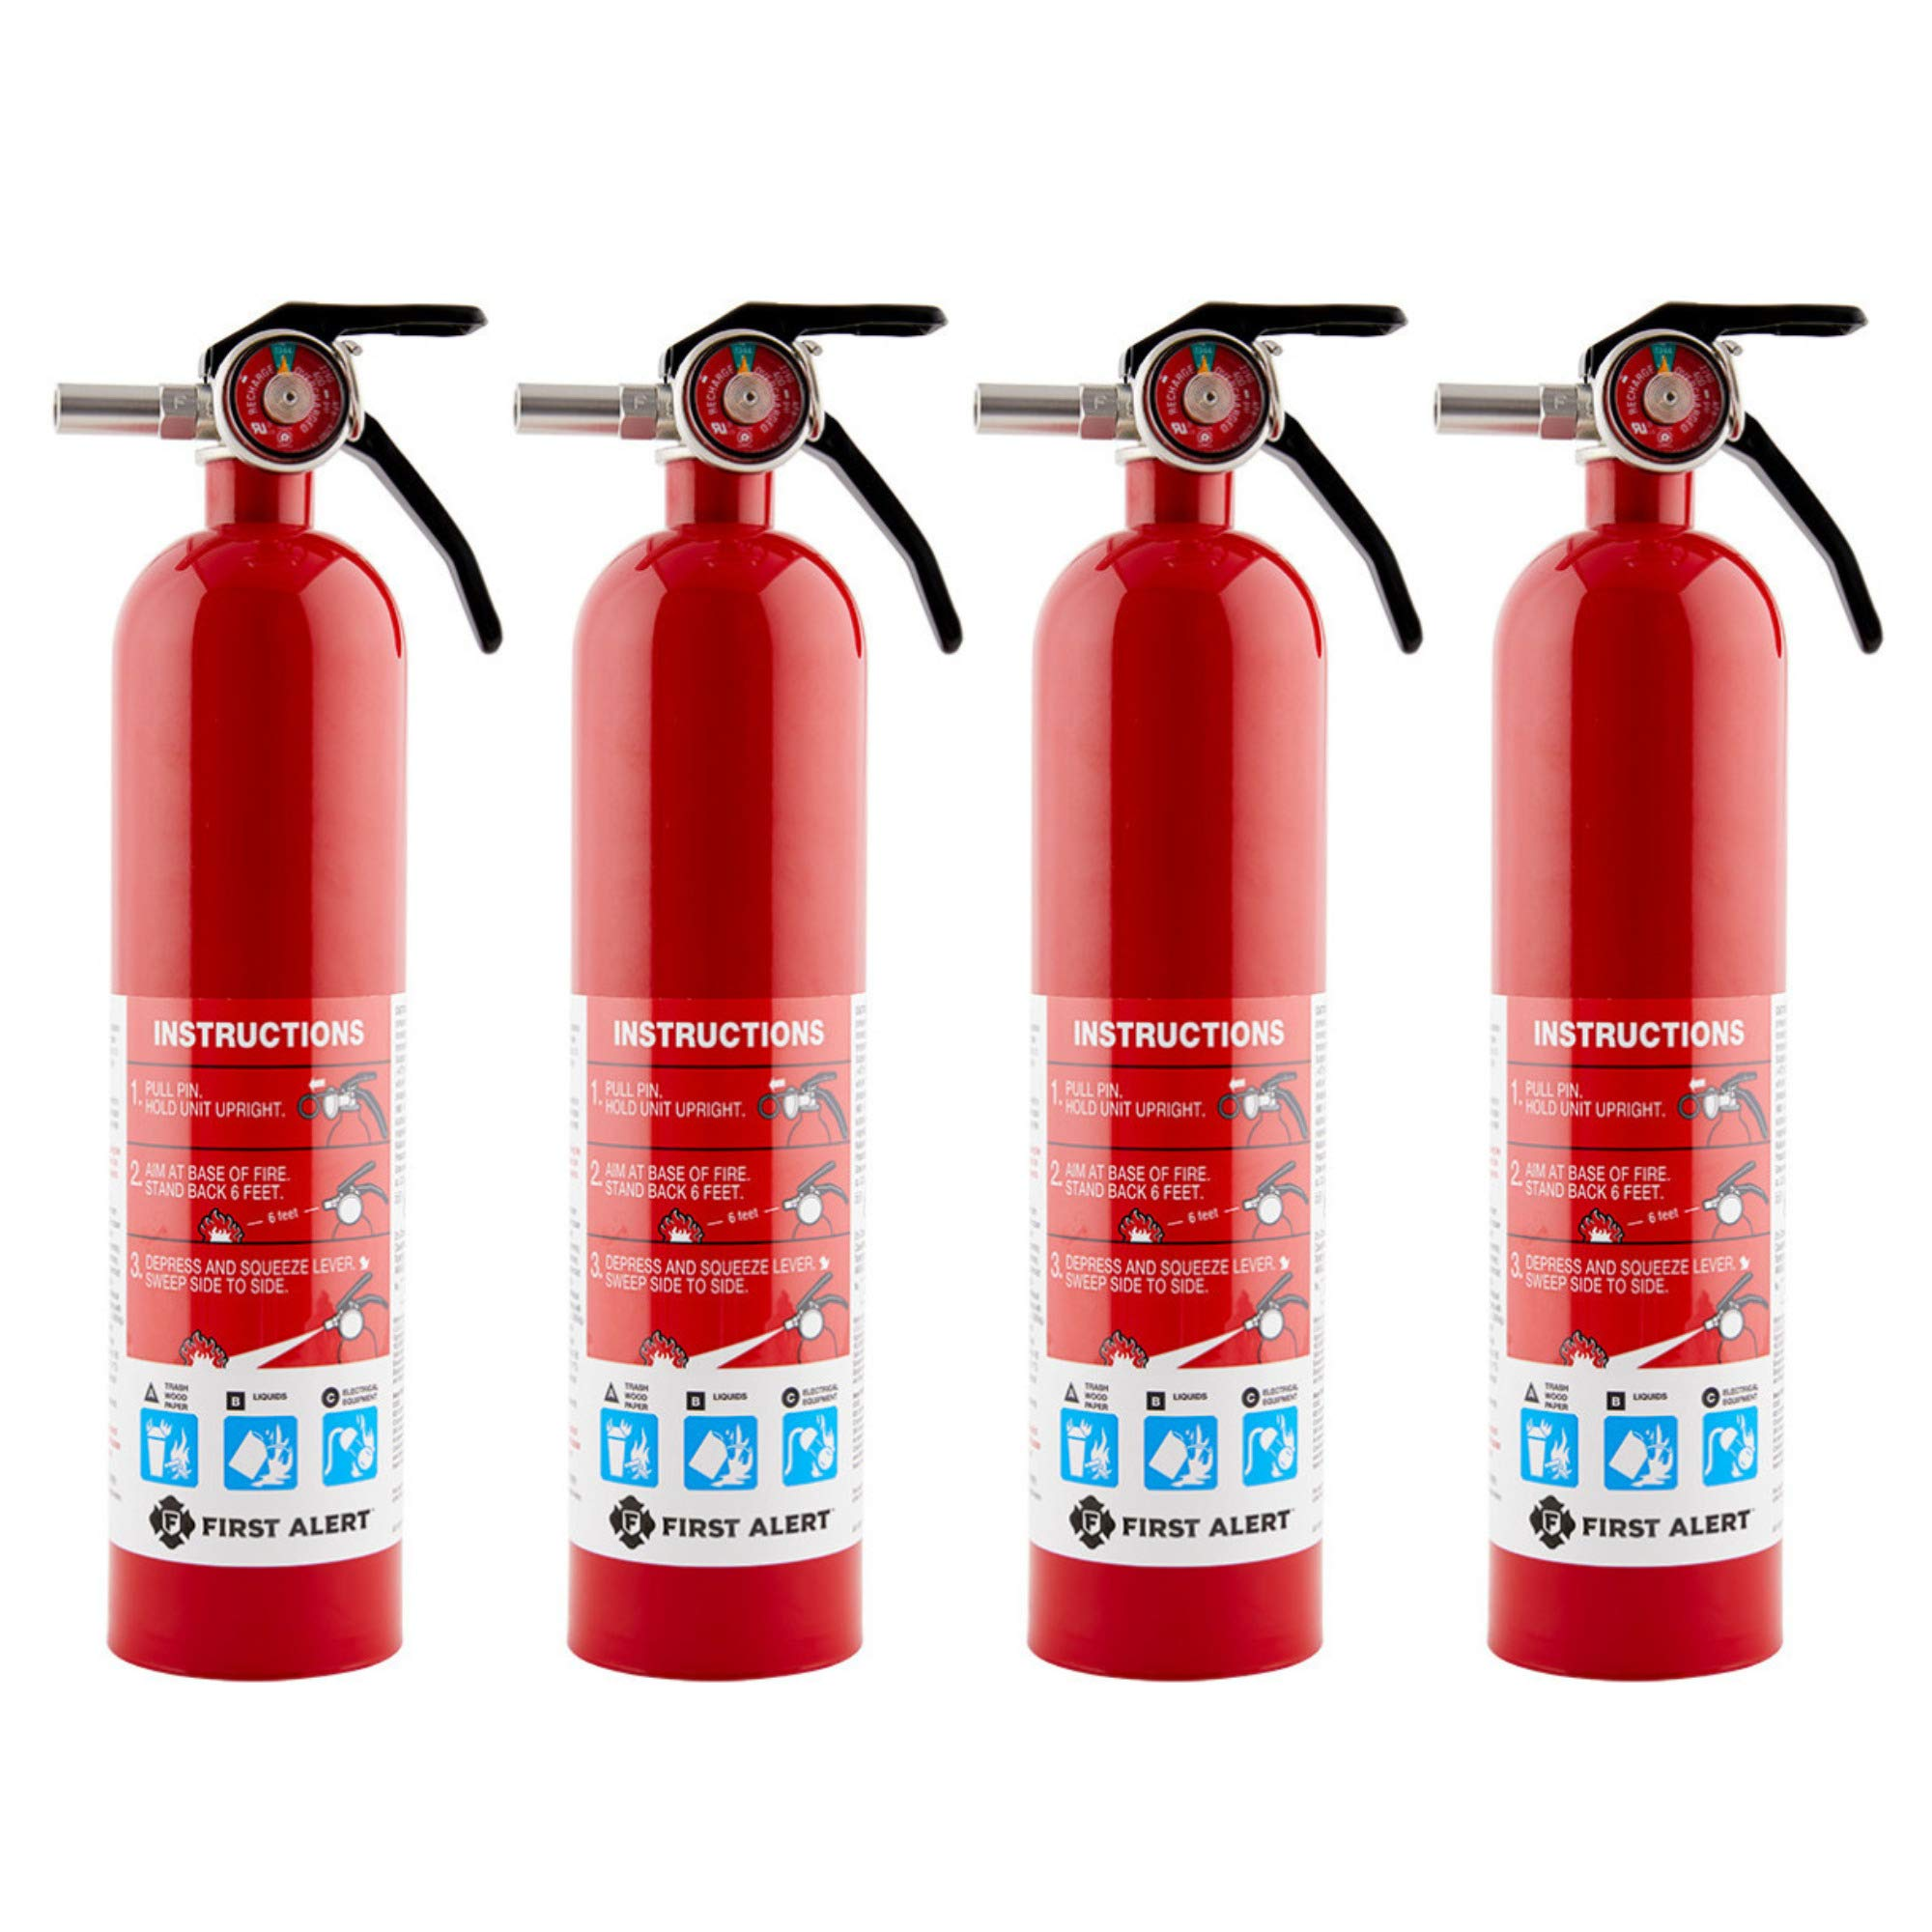 First Alert Home Fire Extinguisher